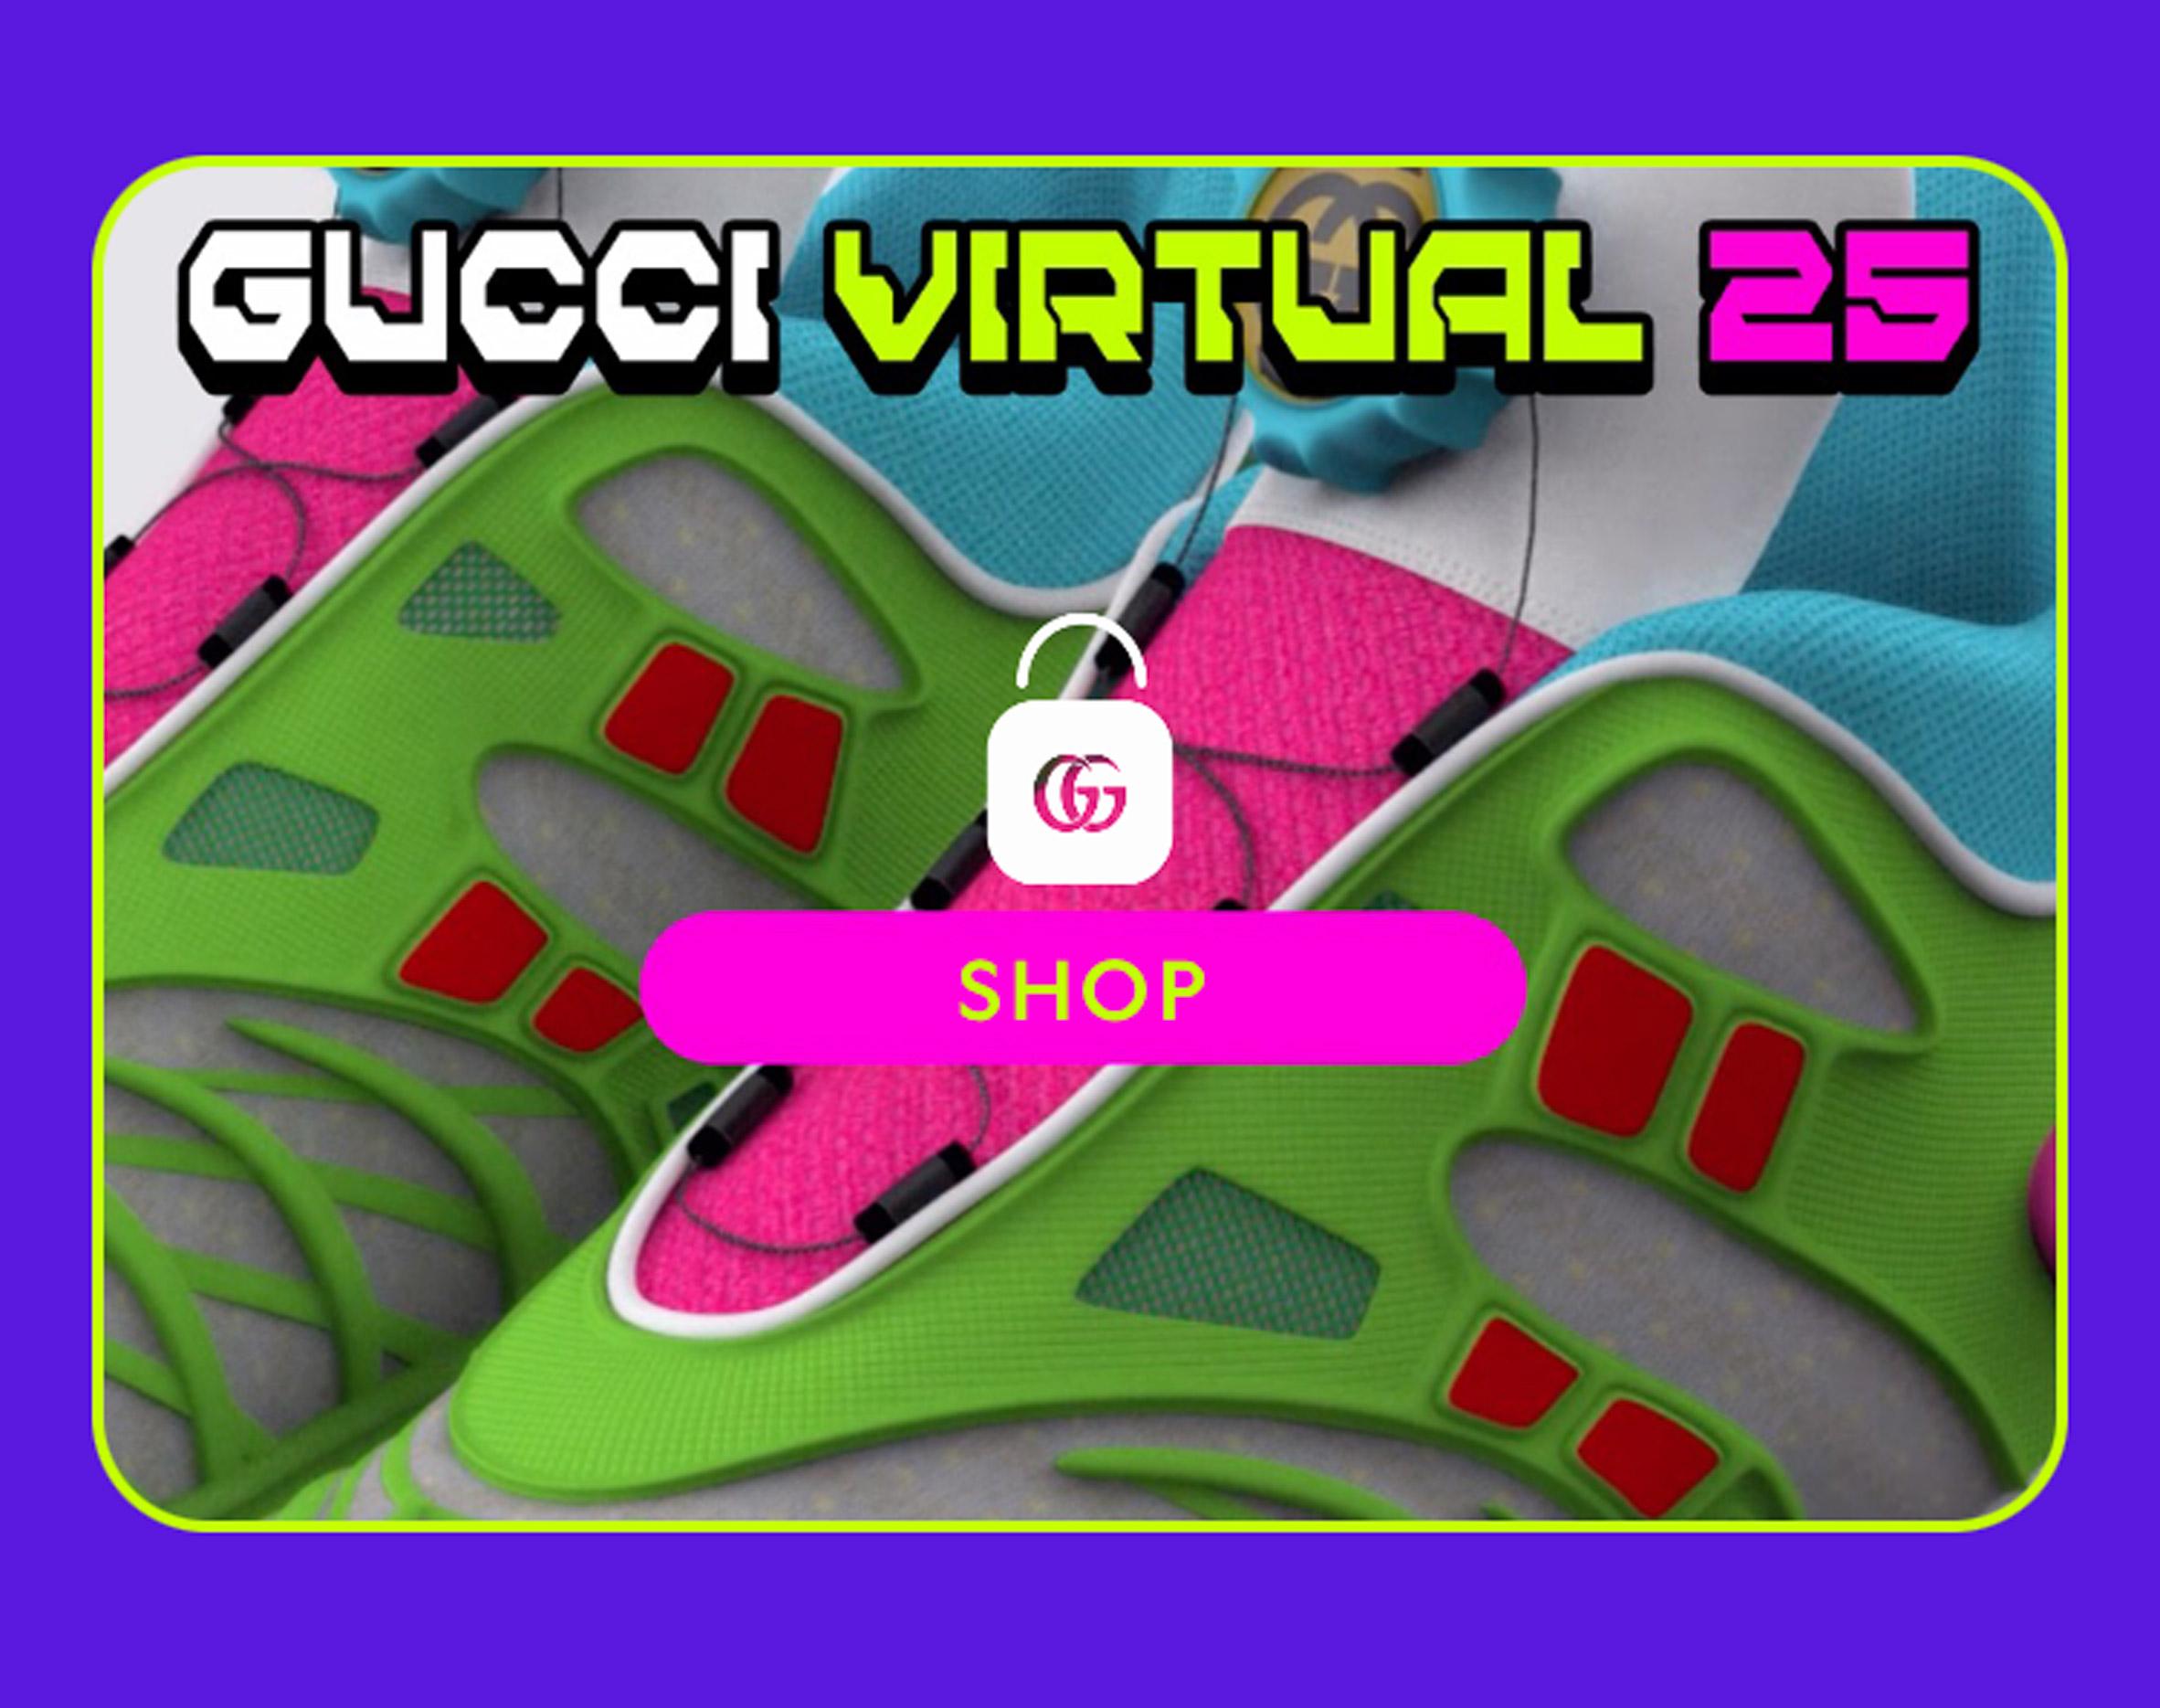 Virtual 25 trainer in Gucci app